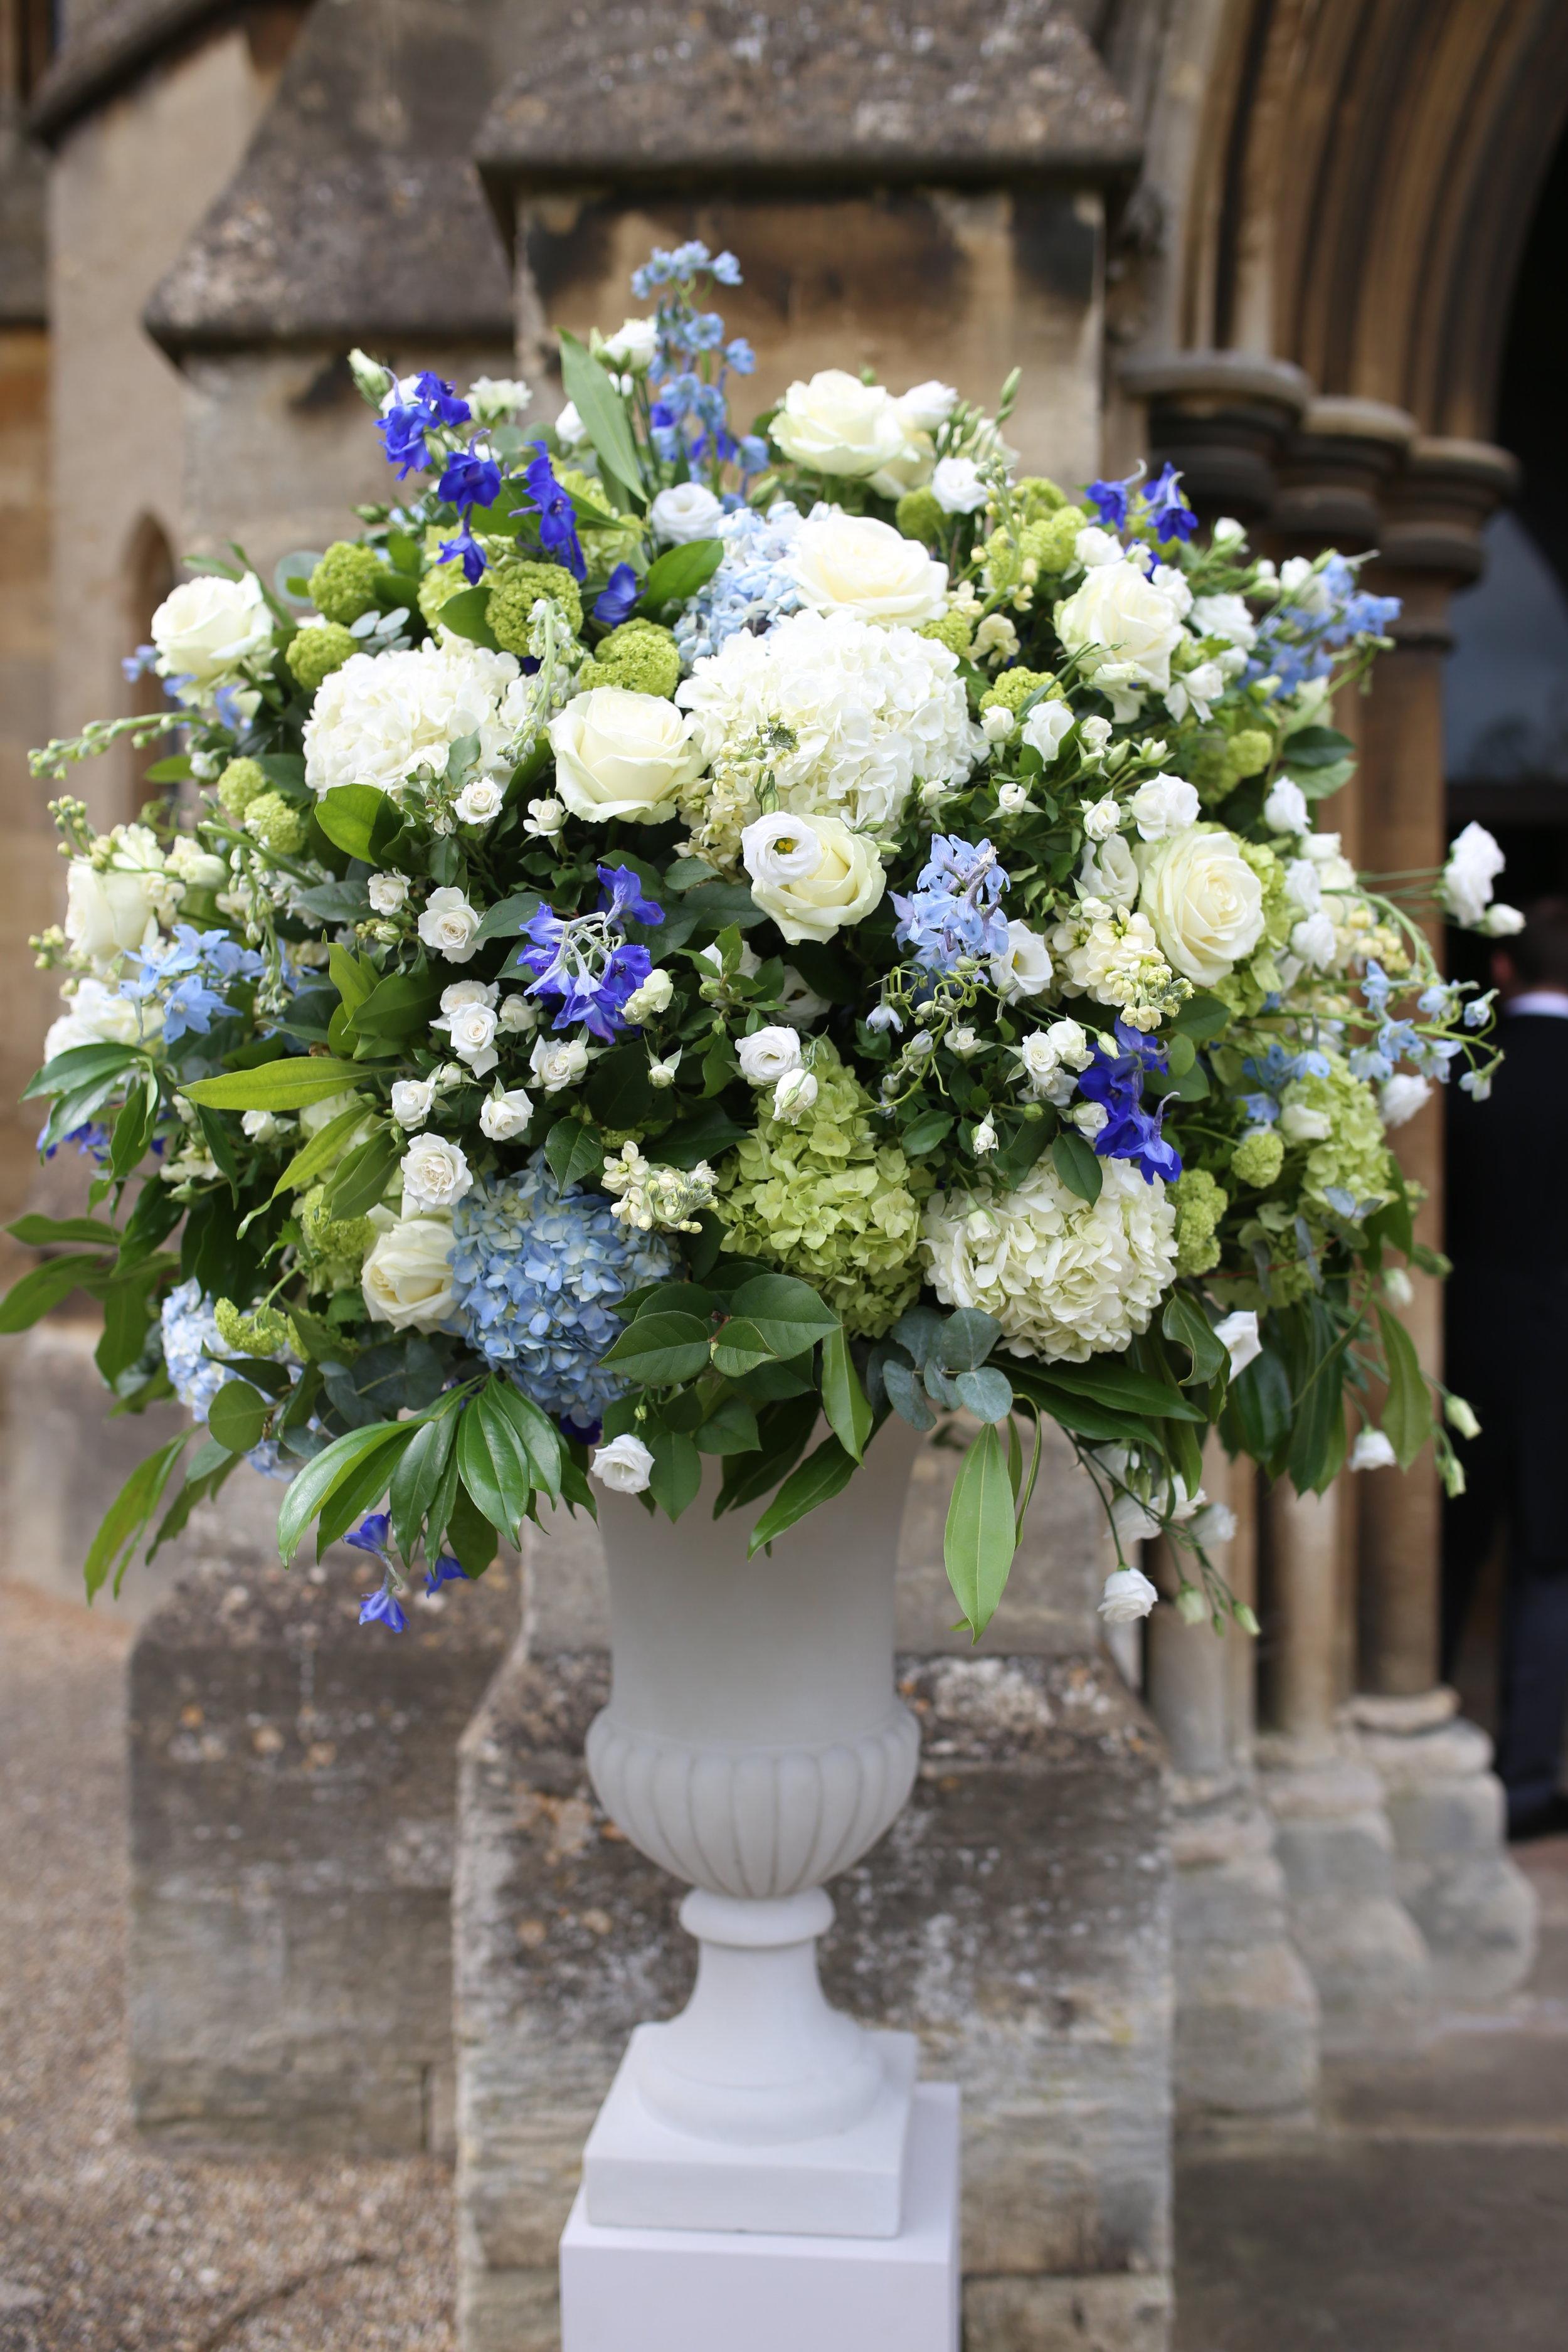 MIRIAM_FAITH_WEDDING_FLOWERS_CEREMONY_URN_CHURCH_PEDESTAL_BLUE_WHITE_GREEN_.JPG